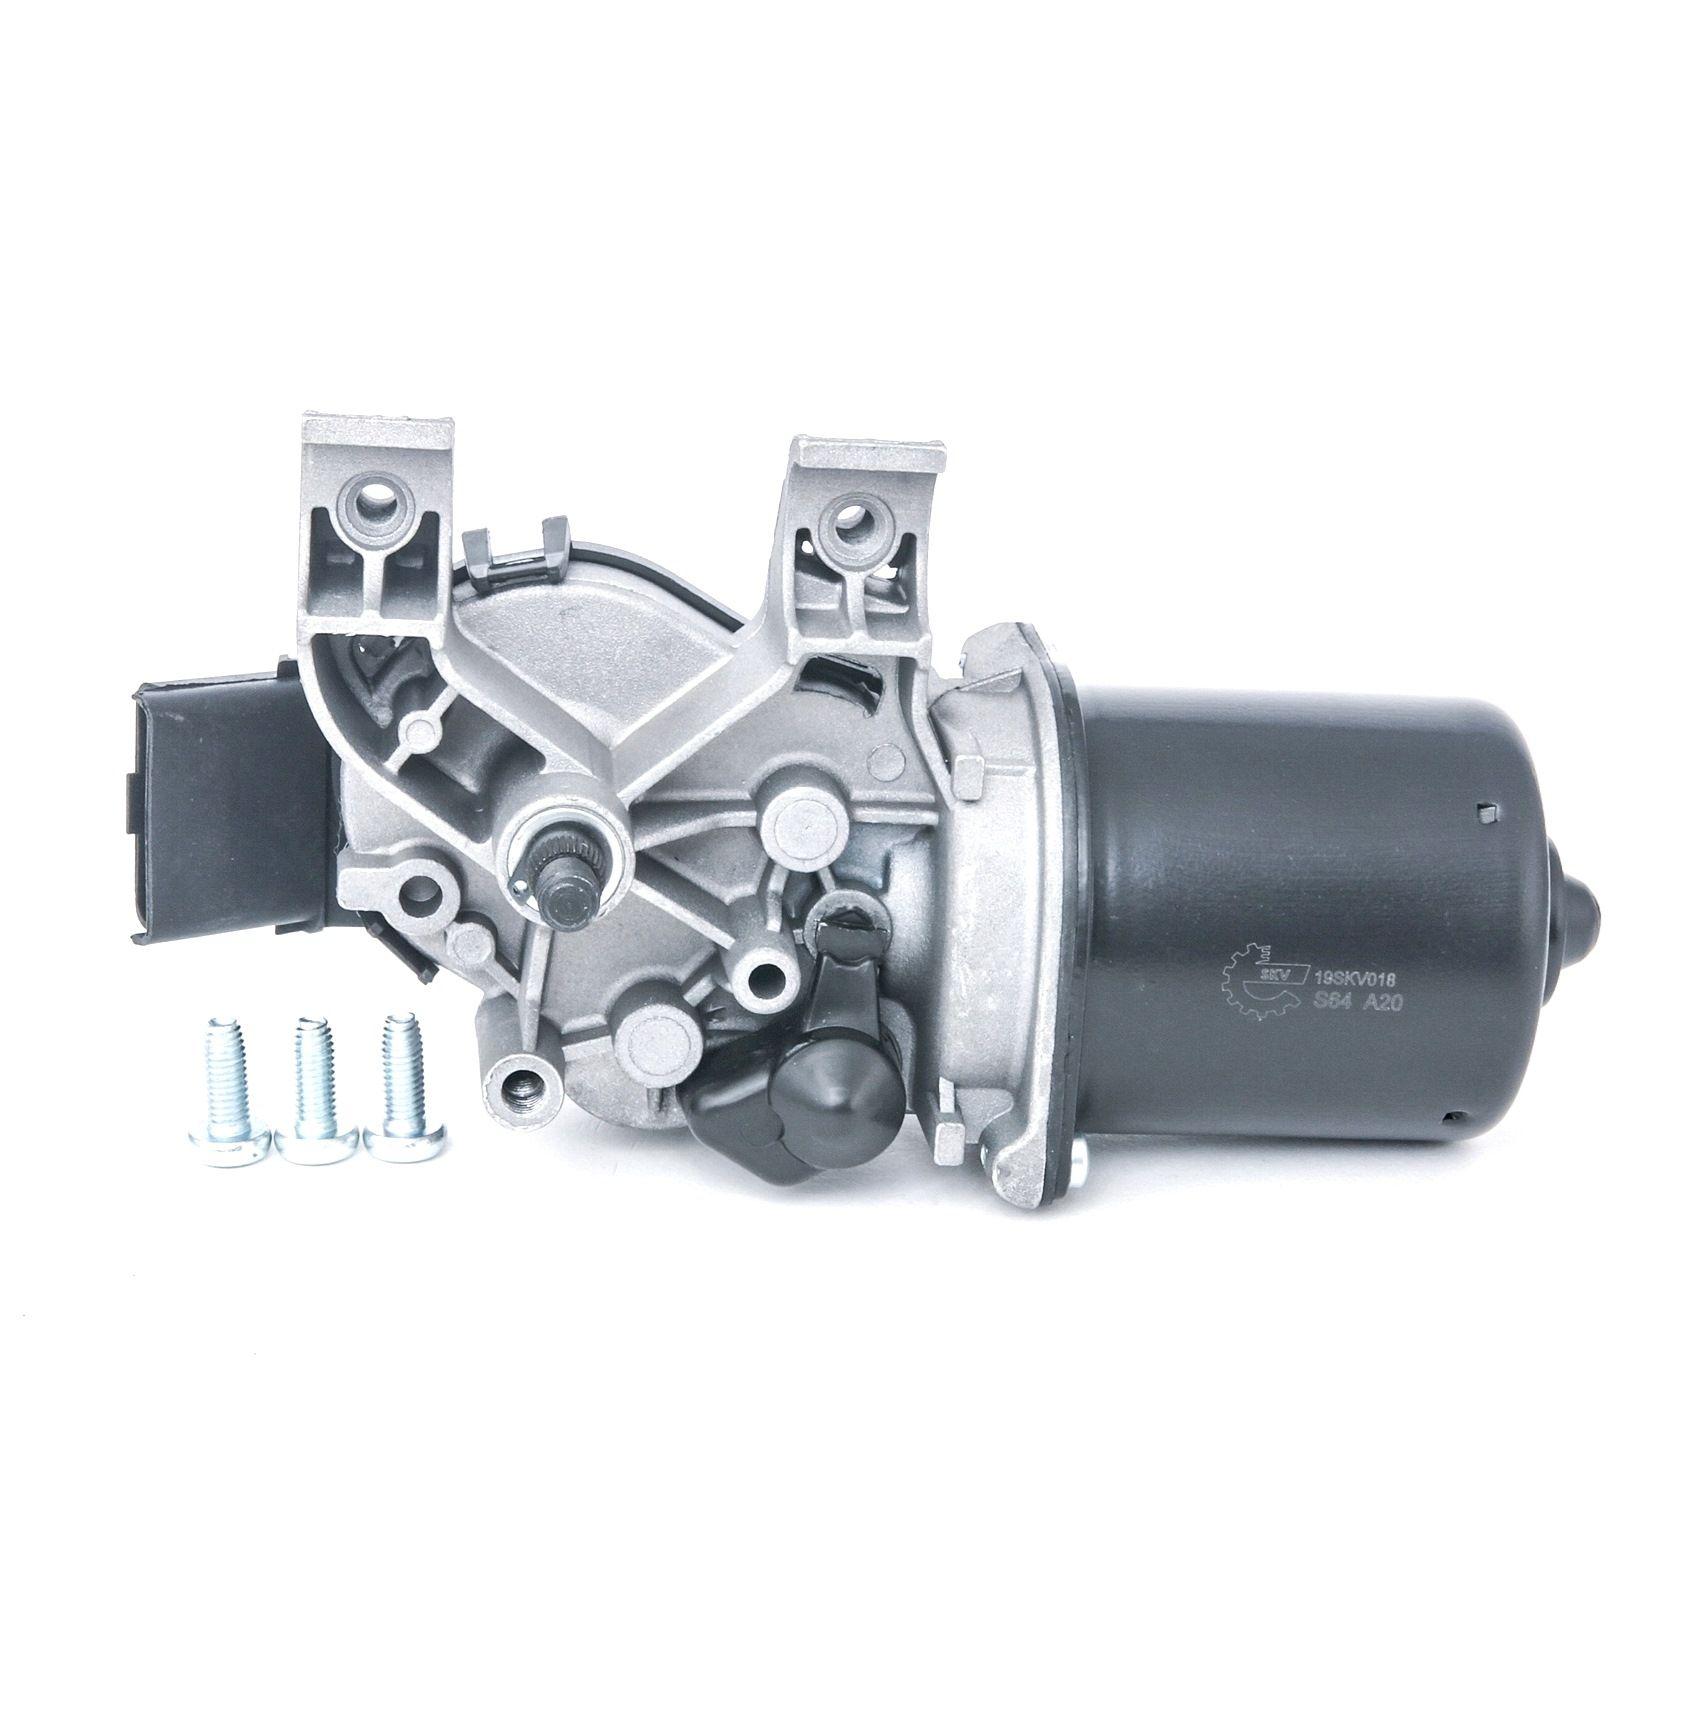 ESEN SKV Ruitenwissermotor RENAULT 19SKV018 7701061590,53567502,7701061590  8200268931